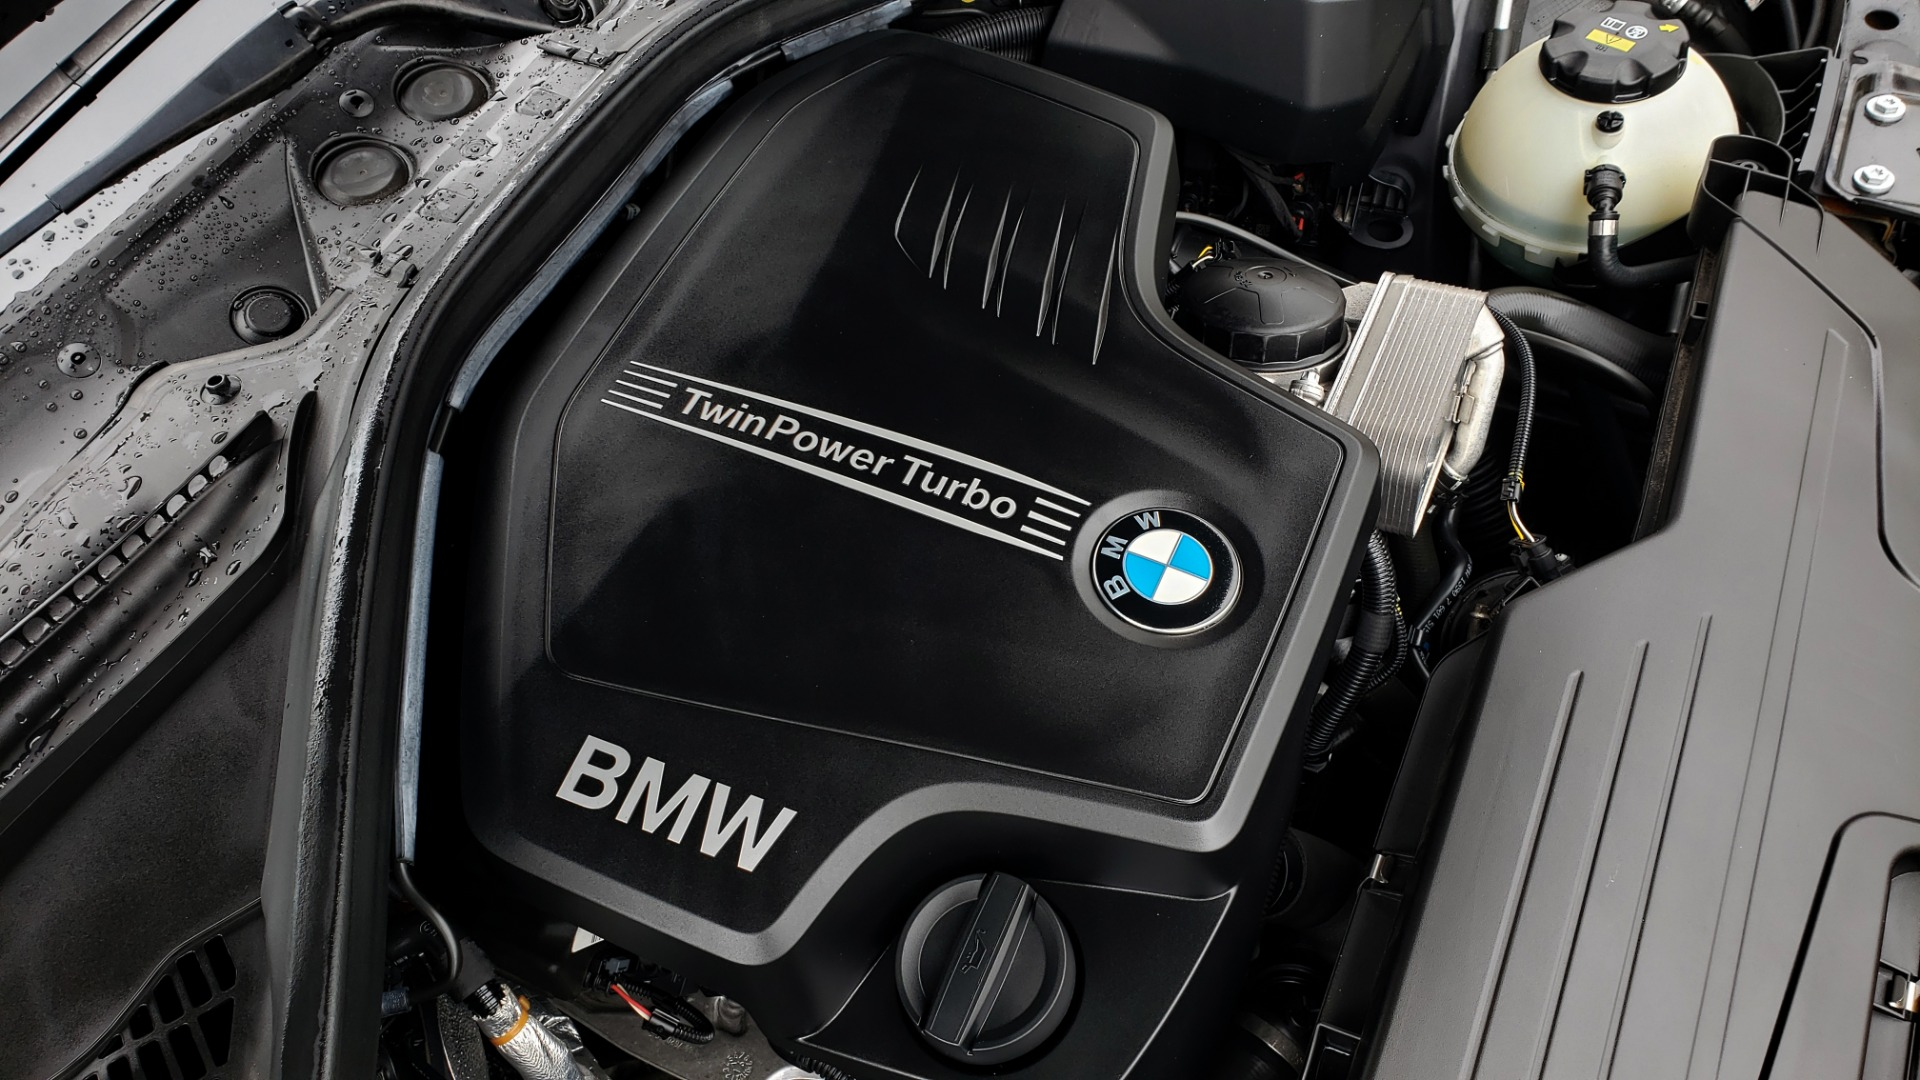 Used 2016 BMW 3 SERIES 328I PREMIUM PKG / DRVR ASST / SUNROOF / PARK ASST for sale Sold at Formula Imports in Charlotte NC 28227 12